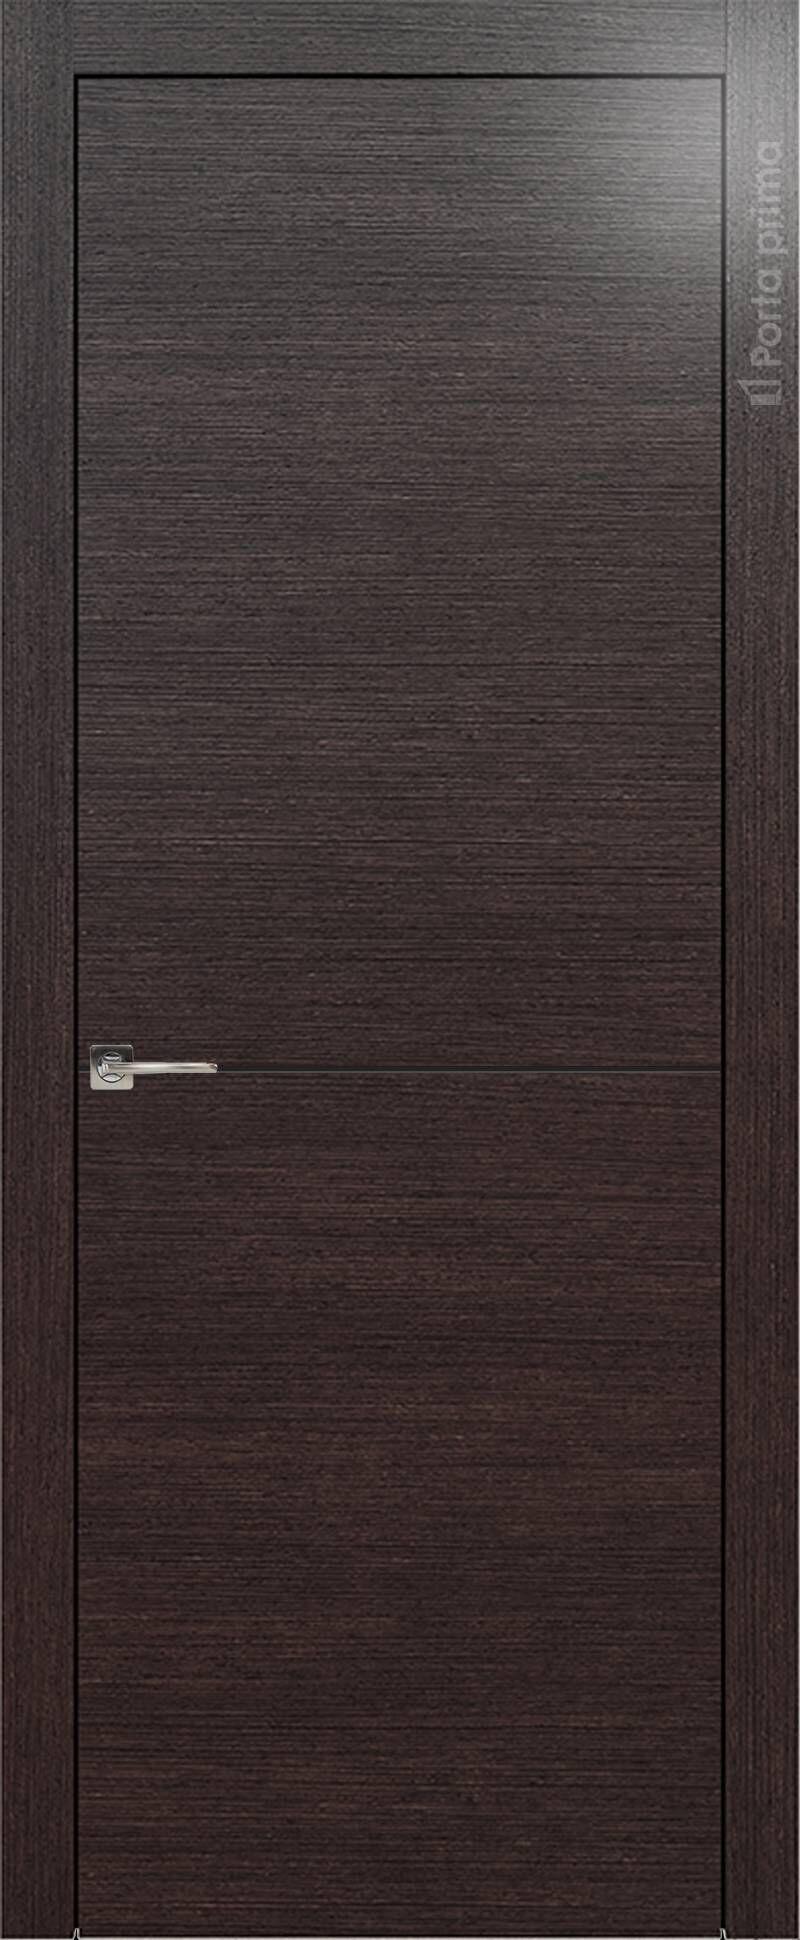 Tivoli Б-2 цвет - Венге Шоколад Без стекла (ДГ)